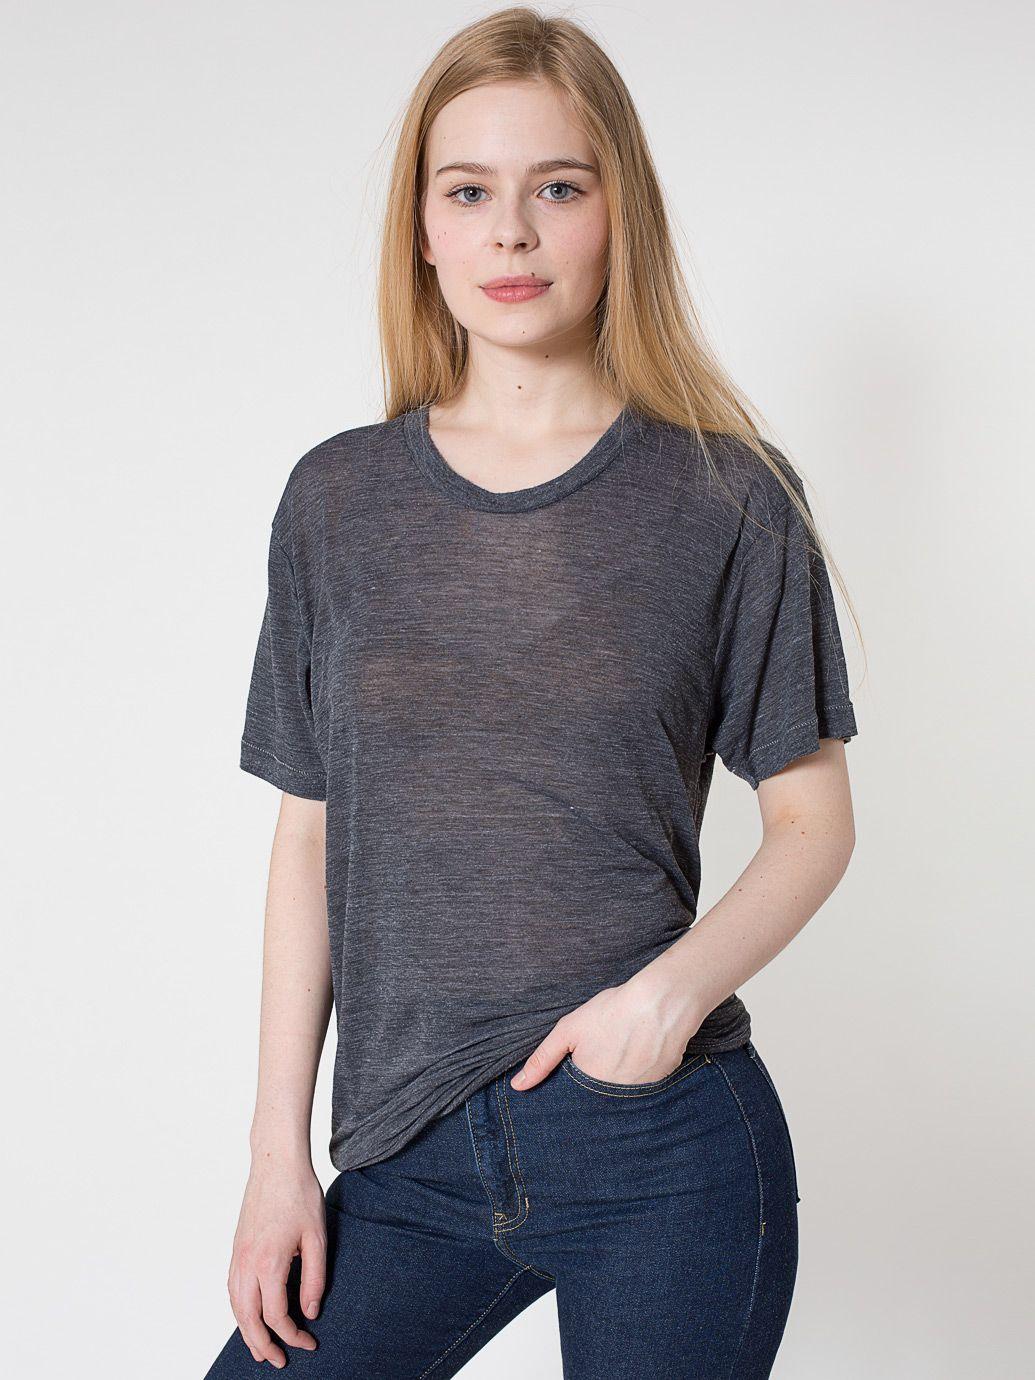 6e6a7e1e066 See Thru Tri-Blend Track Shirt. #AmericanApparel | Clothes | Shirts ...